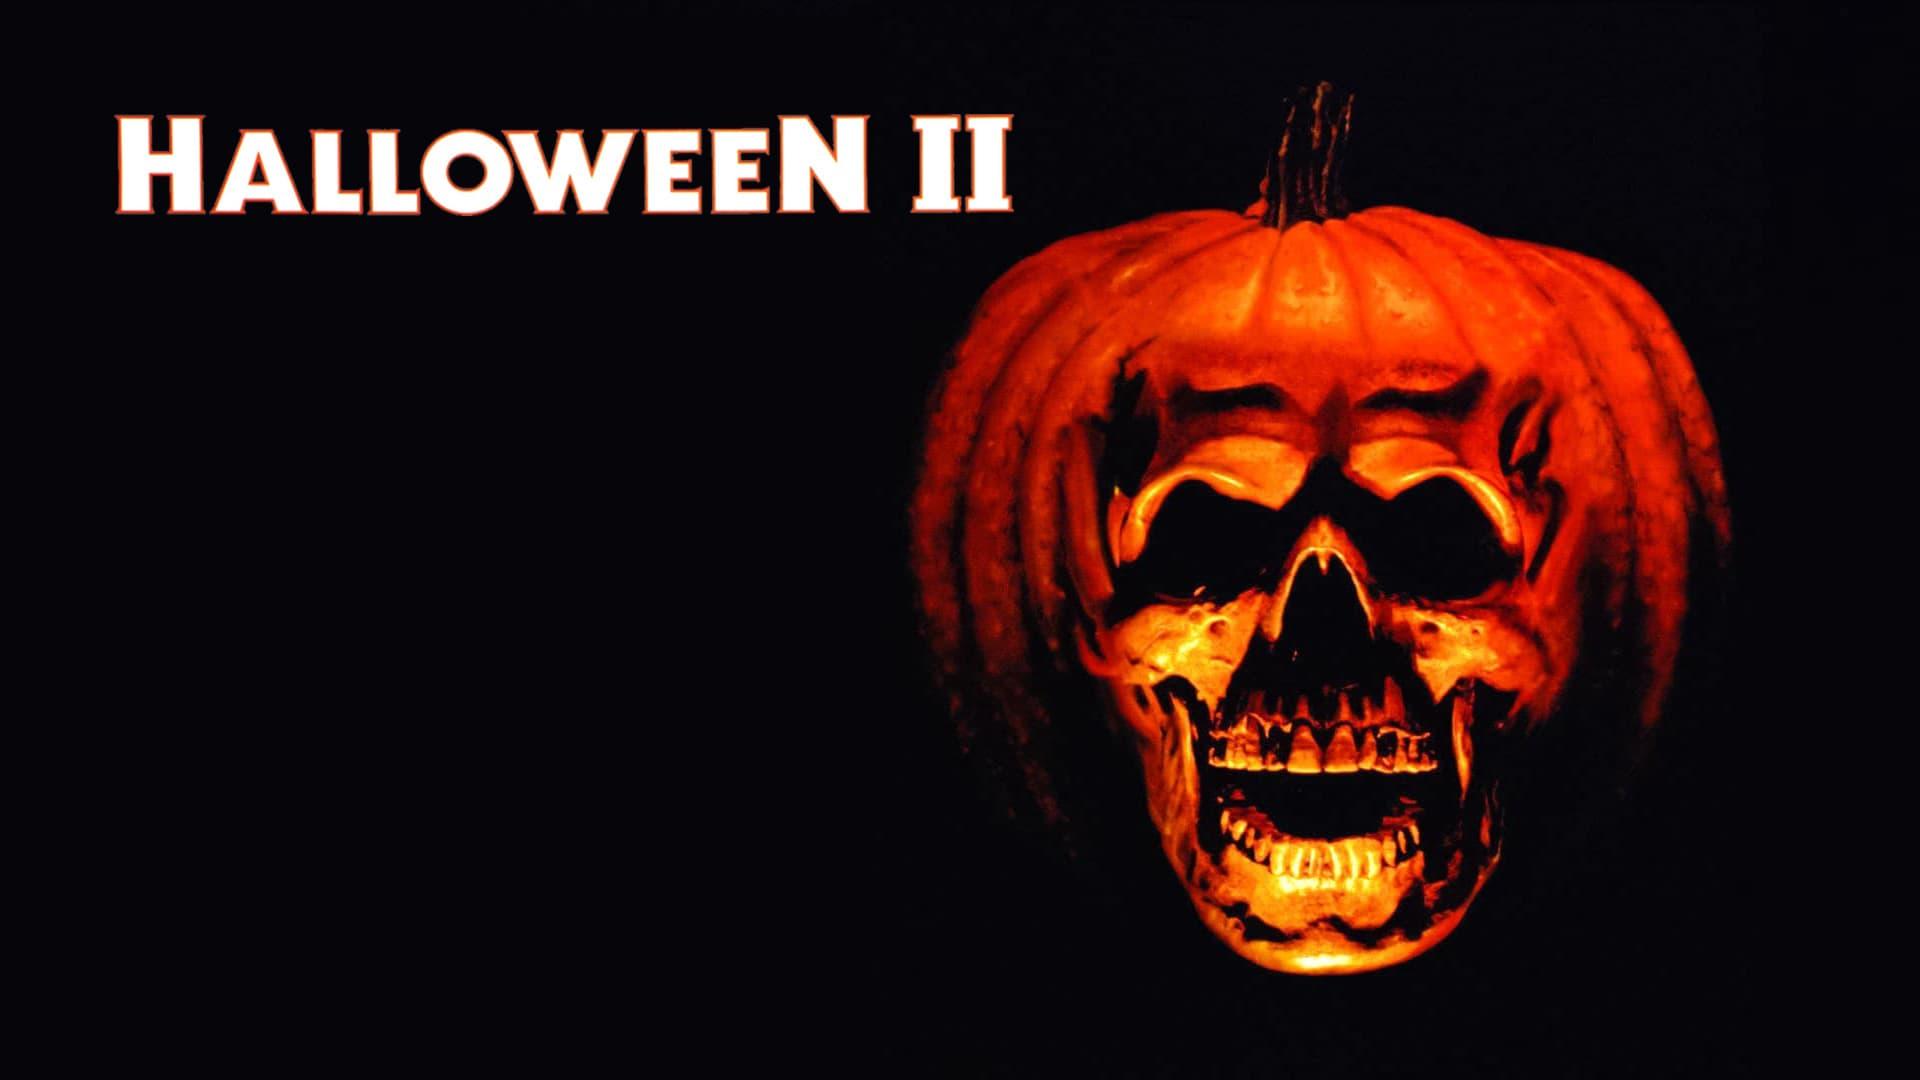 Halloween II Movie Streaming Online Watch 1920x1080